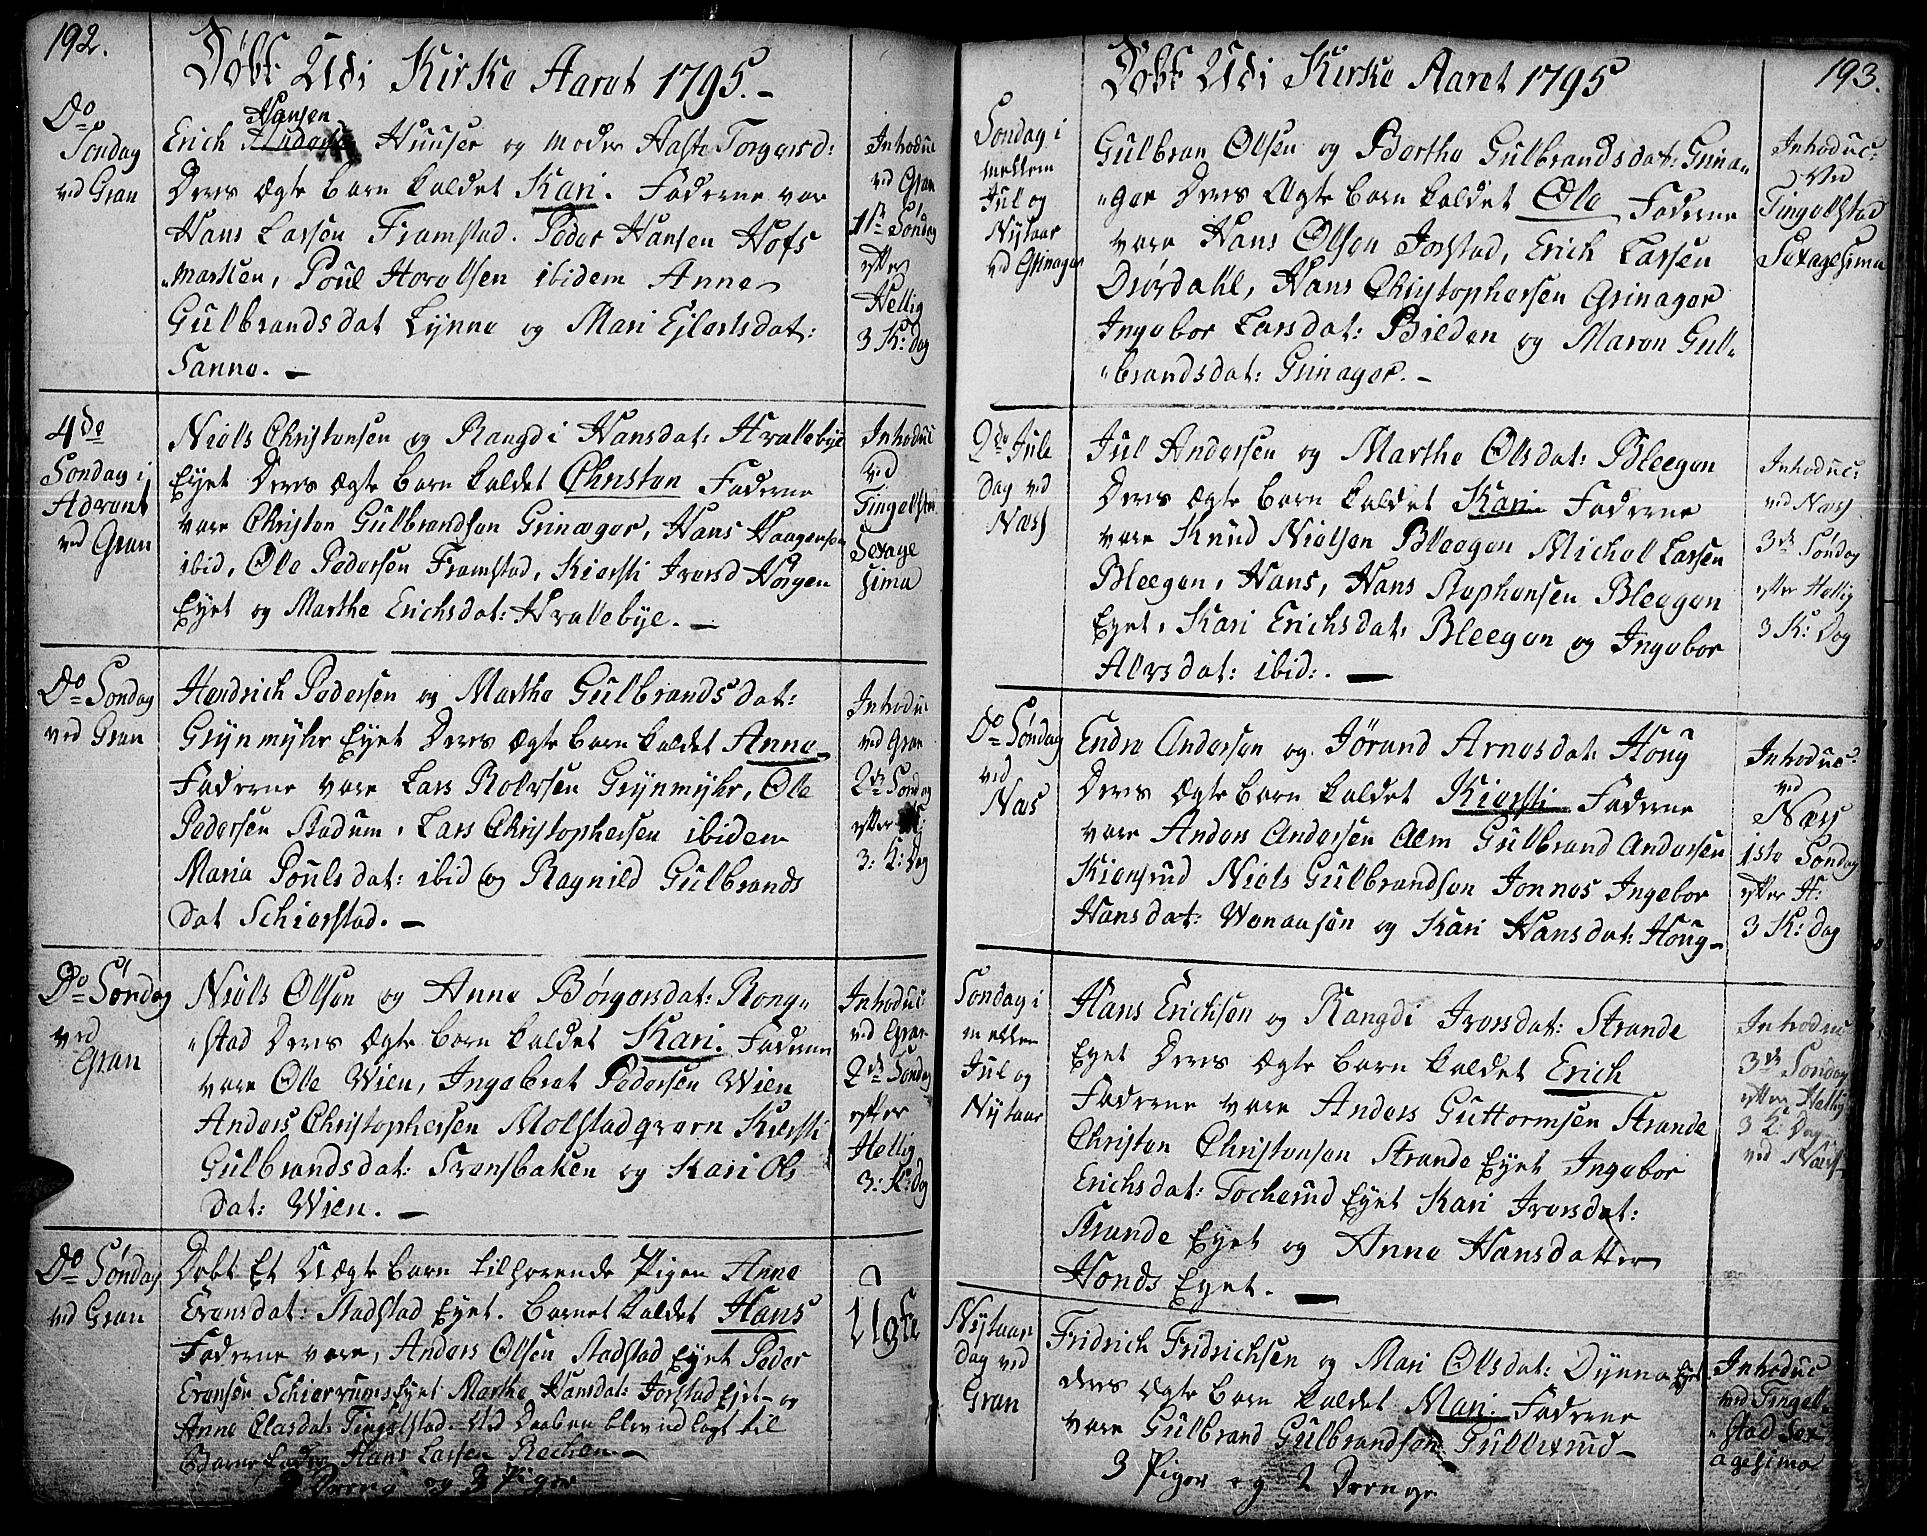 SAH, Gran prestekontor, Ministerialbok nr. 6, 1787-1824, s. 192-193